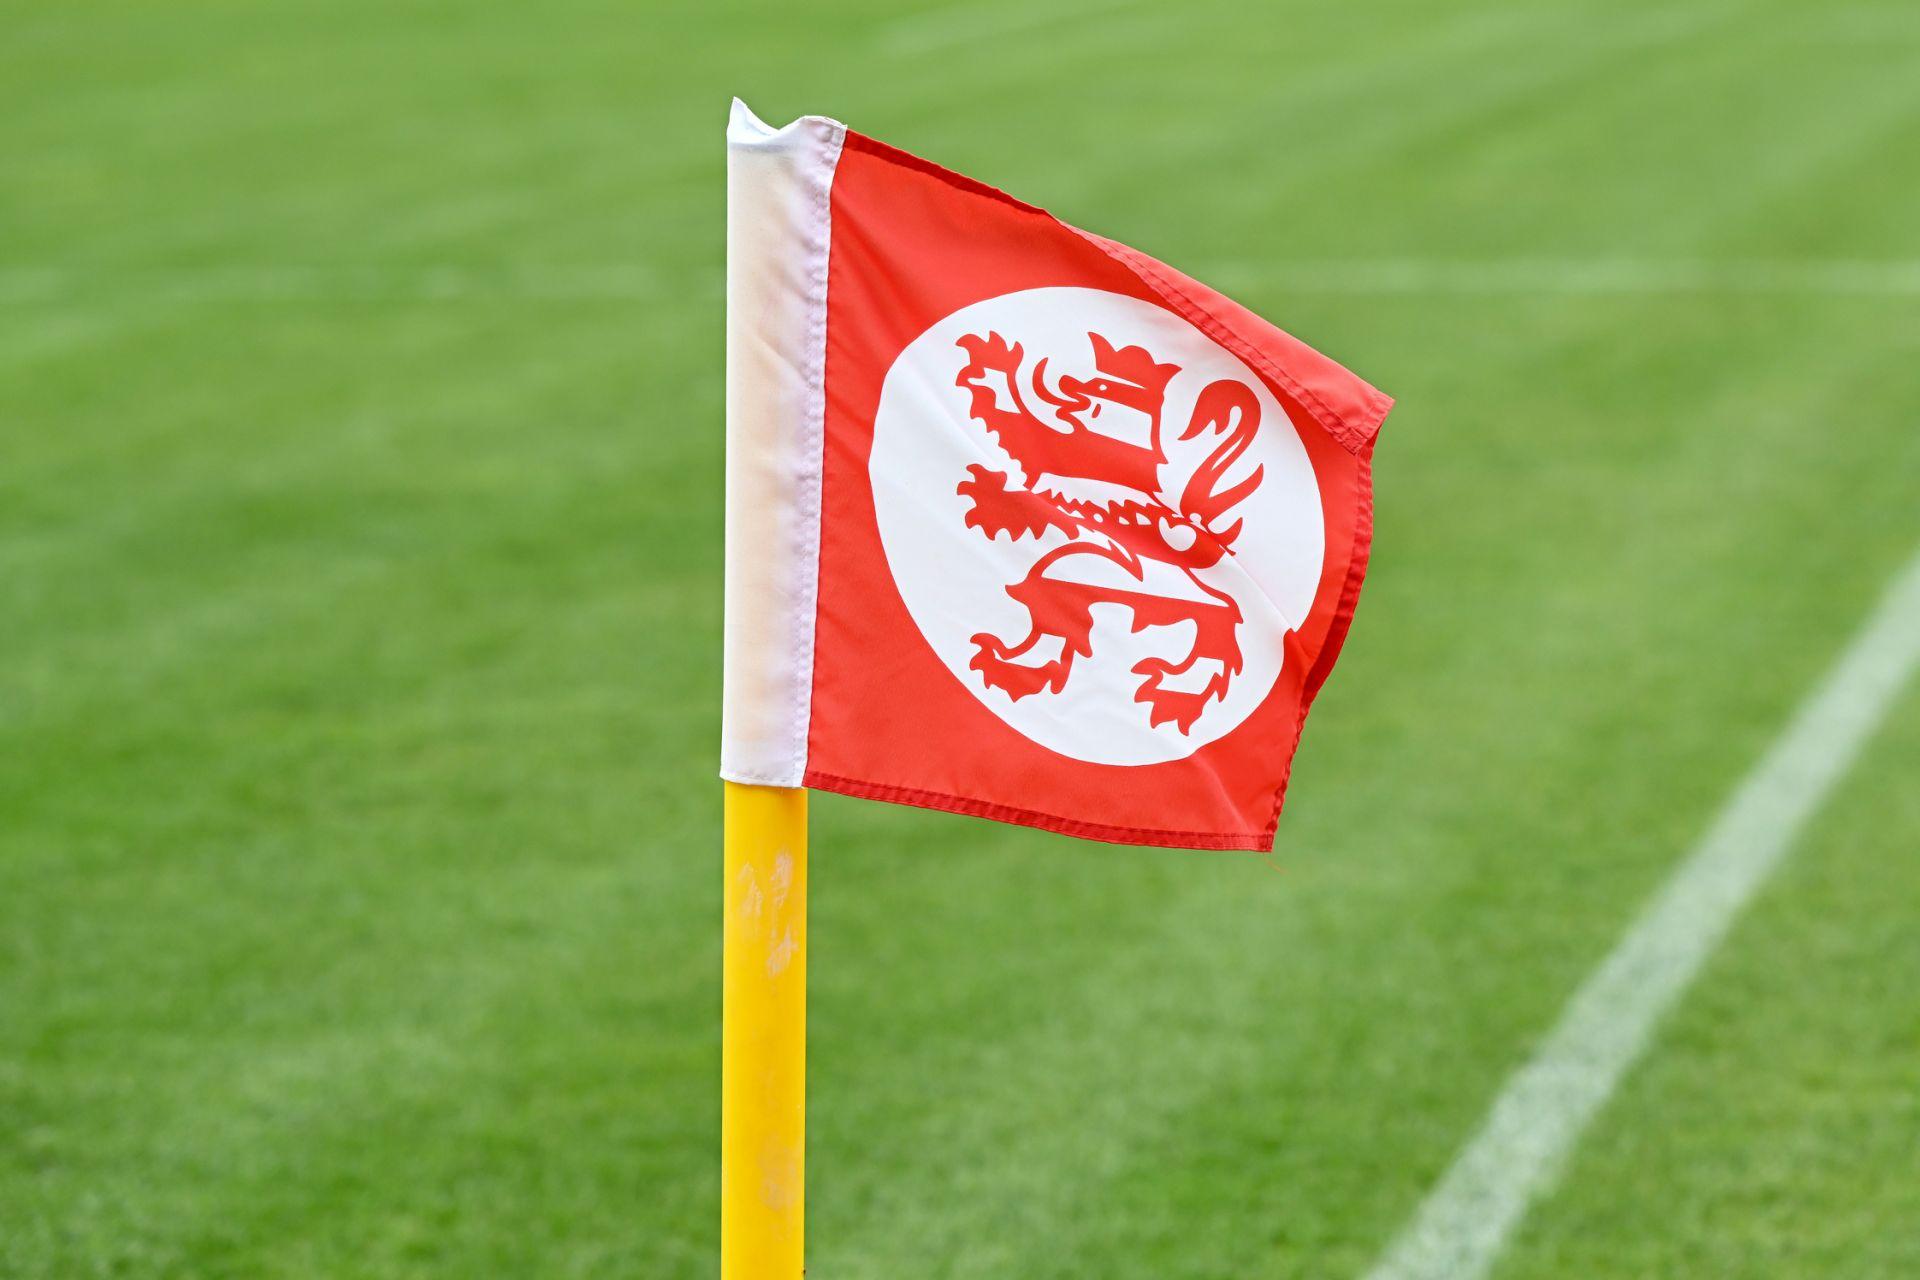 Regionalliga Südwest 2020/21, KSV Hessen Kassel, Kickers Offenbach, Endstand 0:4, Eckfahne